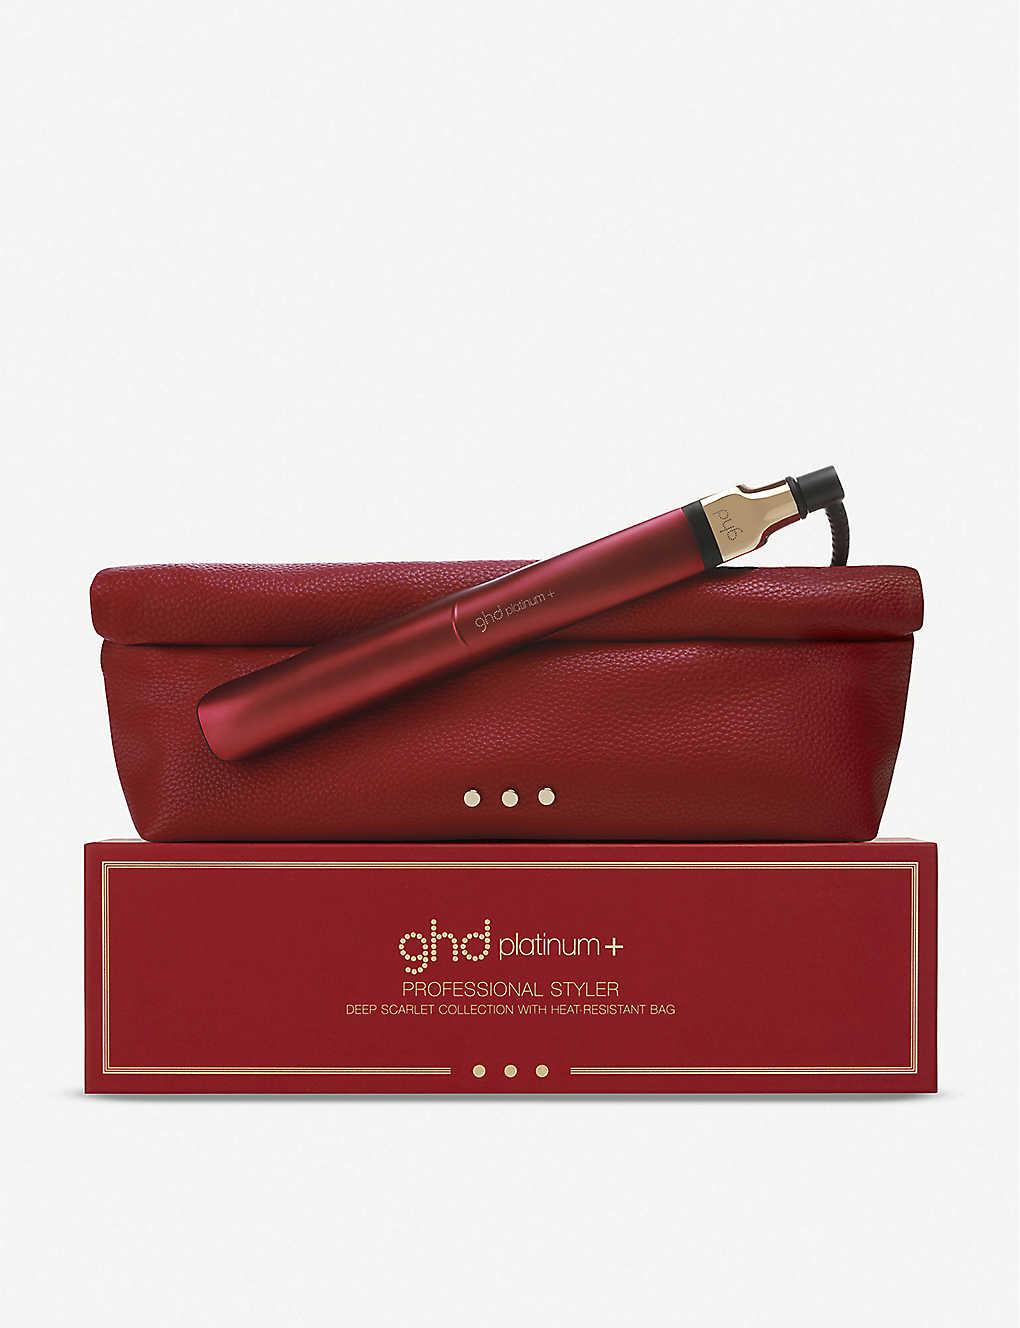 GHD: ghd Platinum+ limited-edition styler